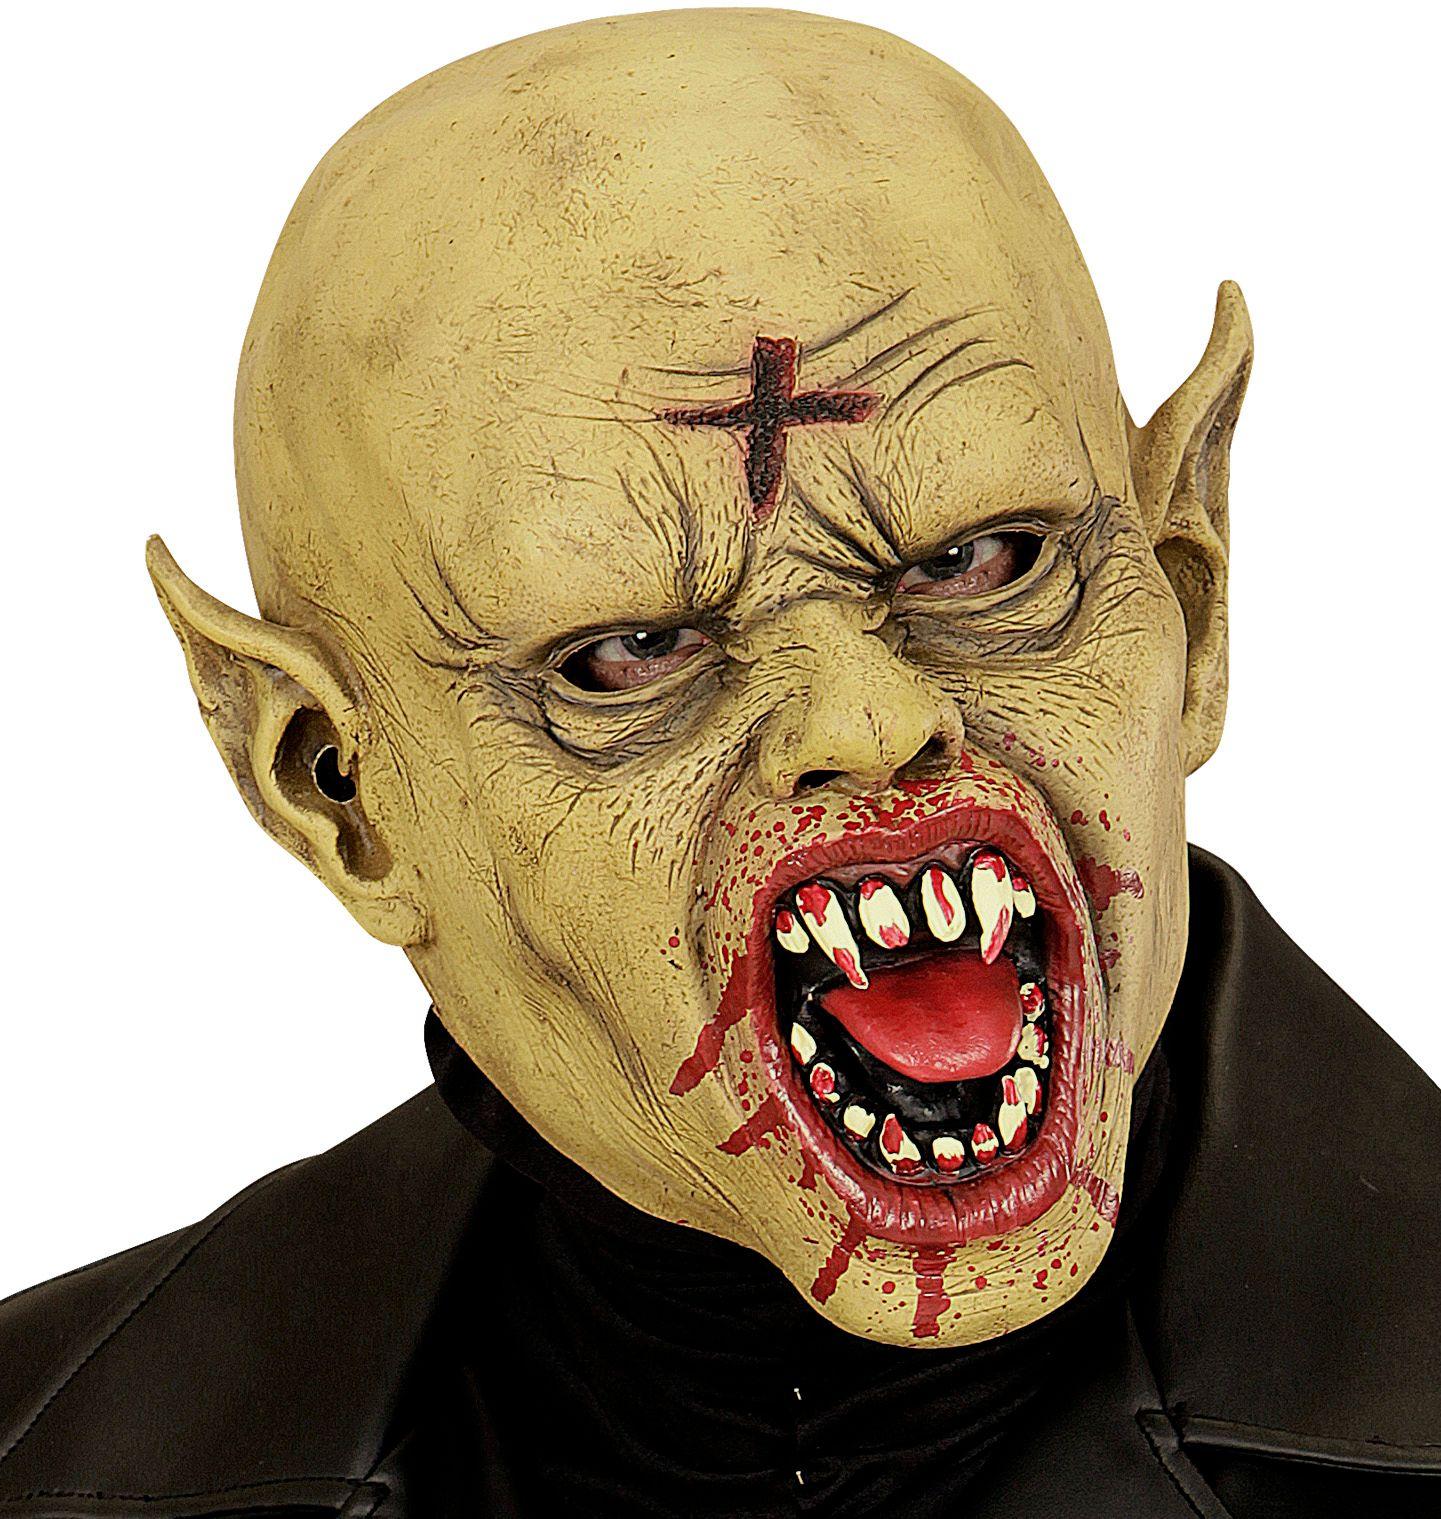 Eng vampiersmasker